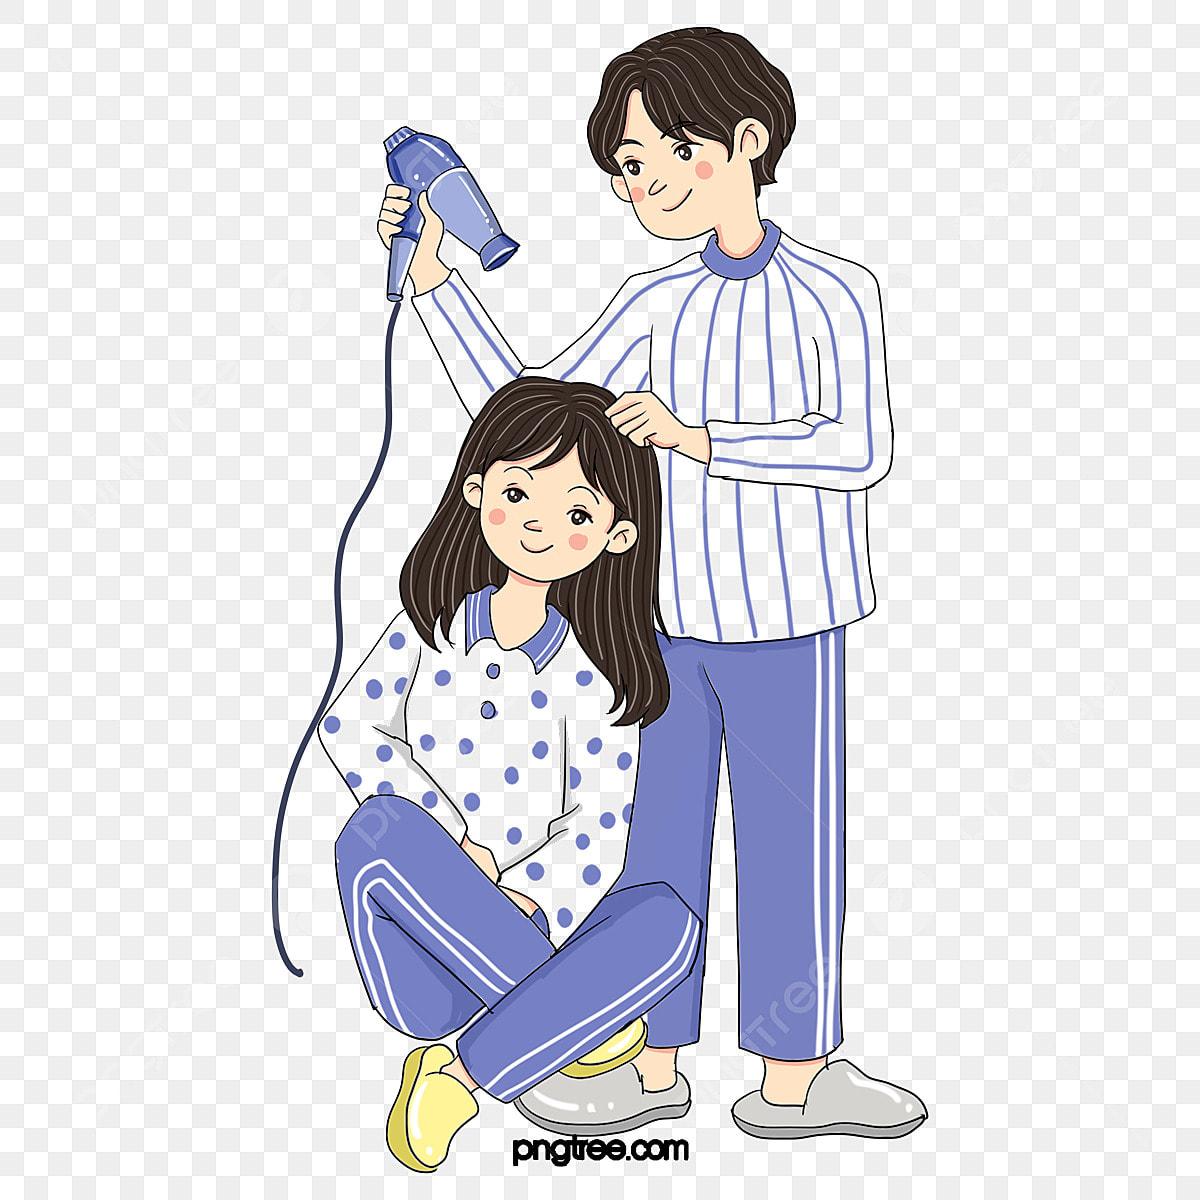 Home Pareja Pijama Secador De Pelo Muebles Para El Hogar Parejas Pijama  PNG y PSD para Descargar Gratis  Pngtree